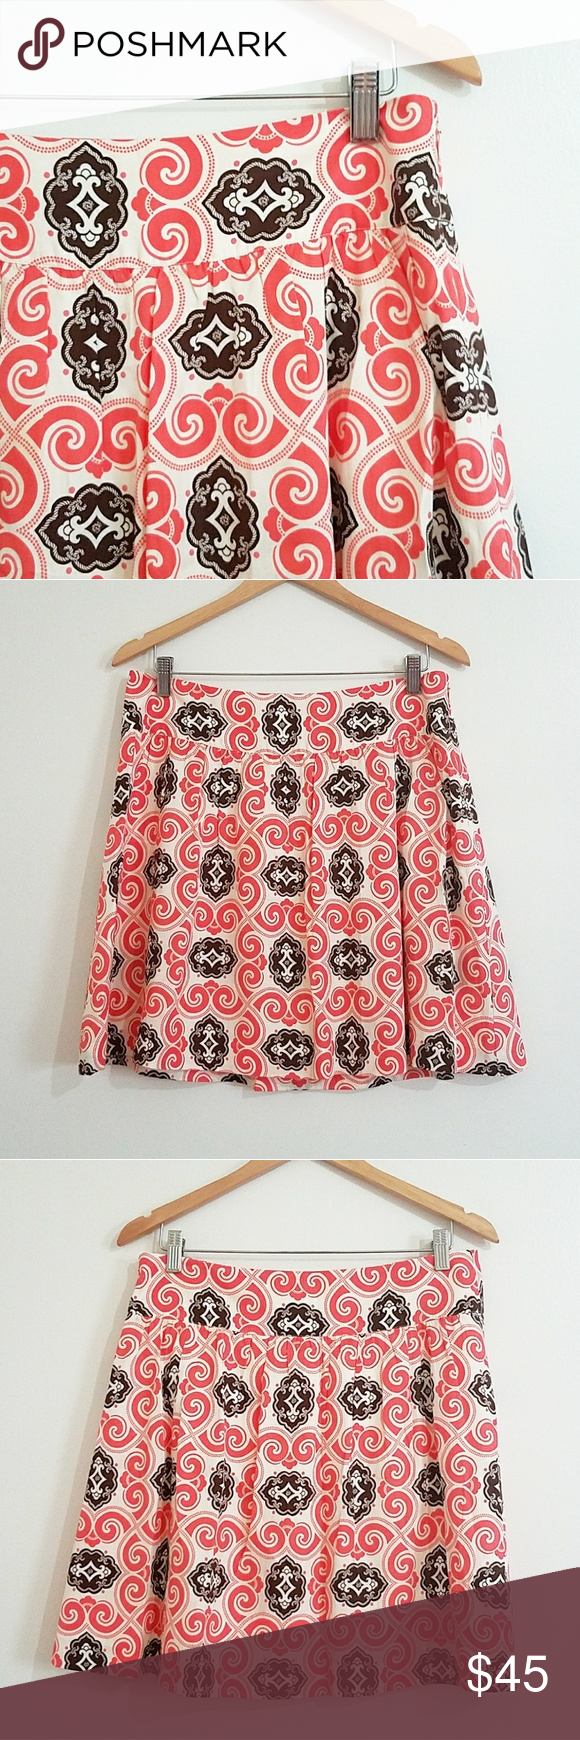 Vineyard Vines Skirt Trendy Vineyard Vines Skirt. Size 10. Shell: 52% Silk 48% Cotton. Lining: 100% Acetate. Vineyard Vines Skirts